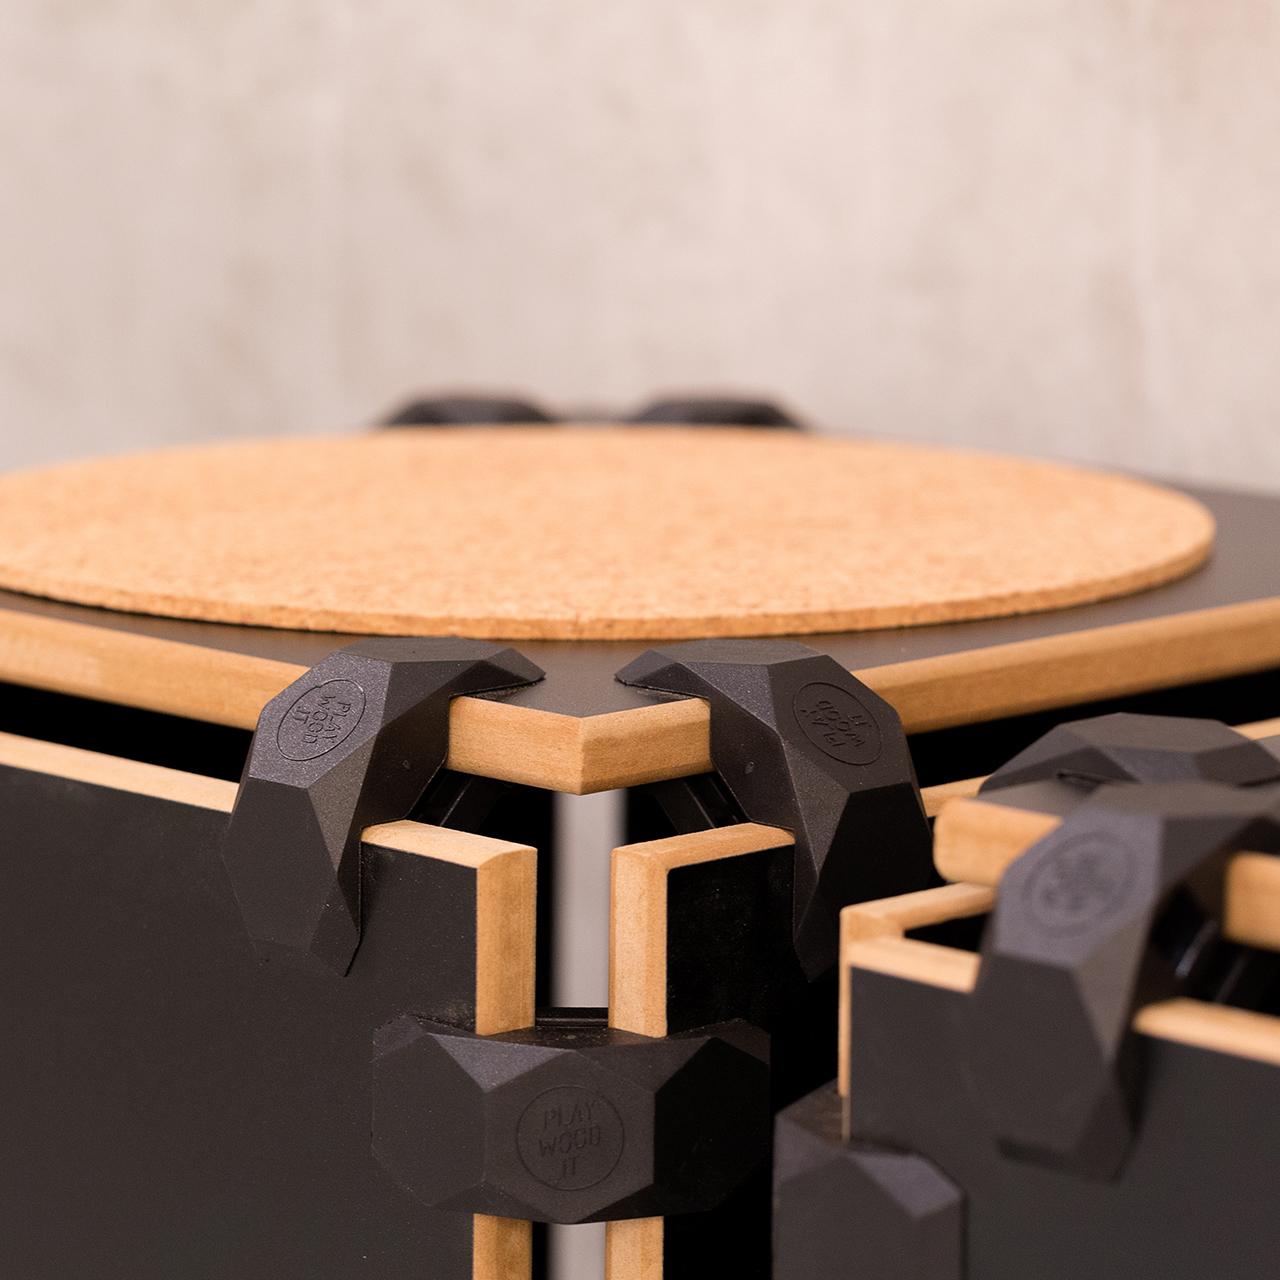 PlayWood_Connectors_Joint_Furniture_DIY212.jpg